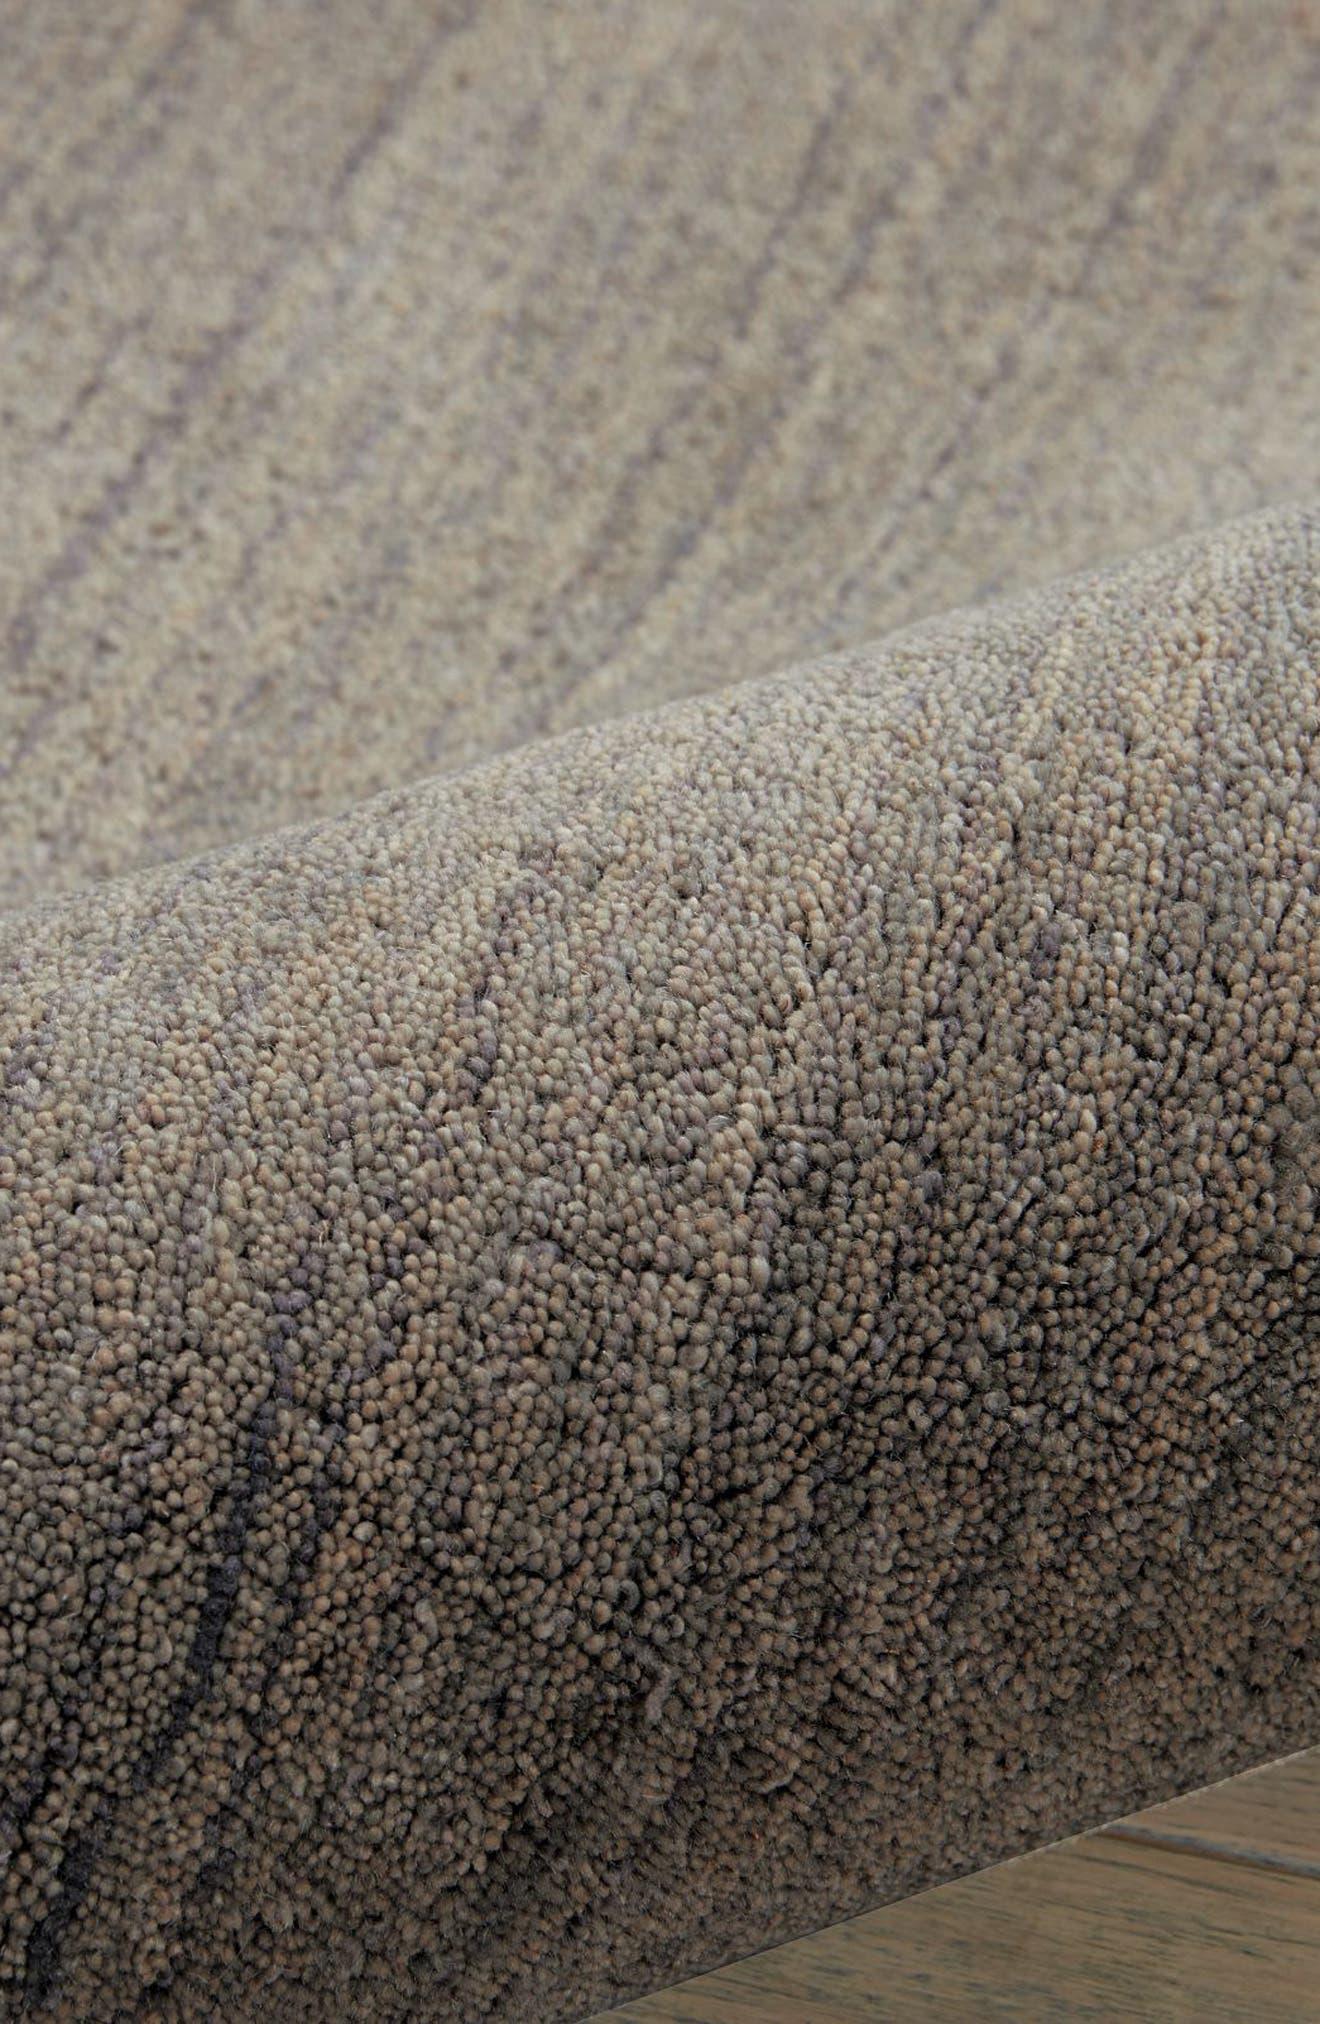 Haze Smoke Wool Area Rug,                             Alternate thumbnail 2, color,                             030